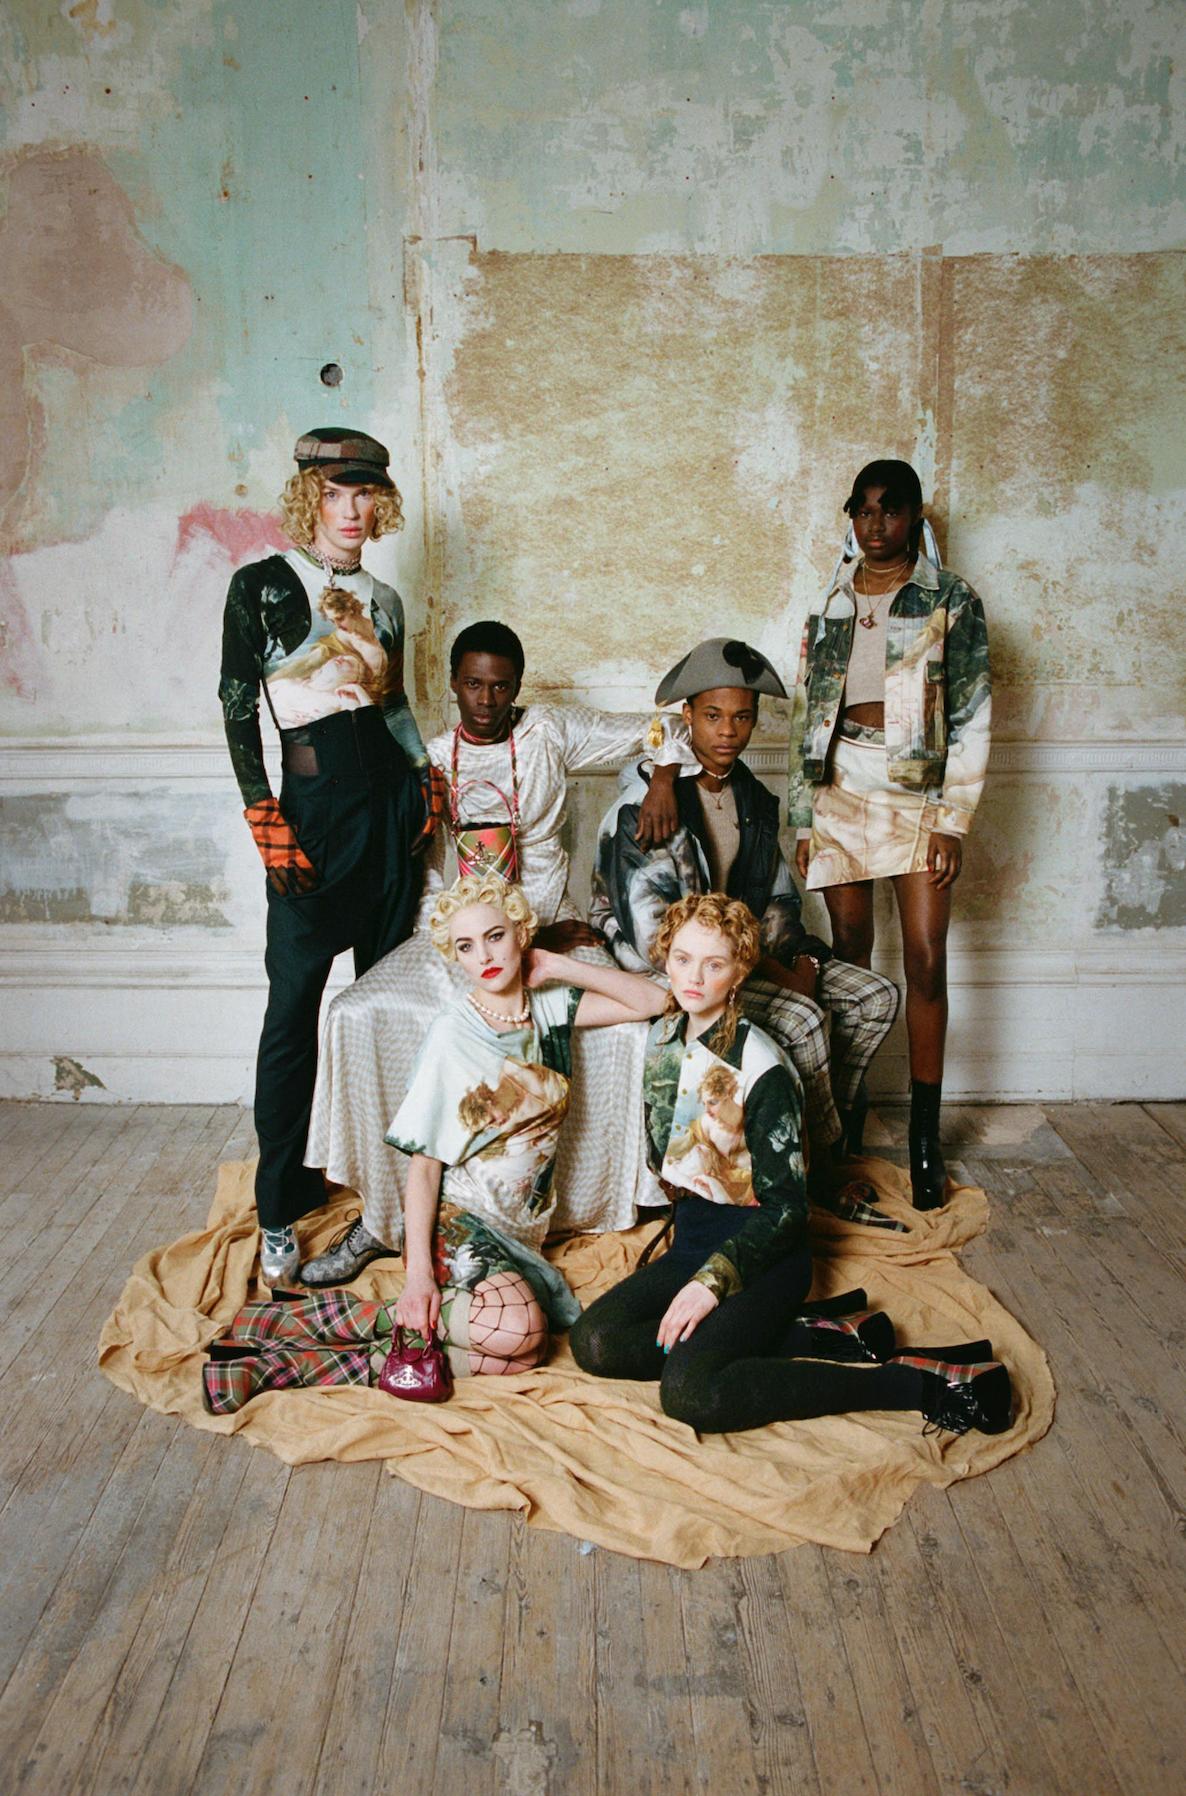 Collection Vivienne Westwood Automne/Hiver 2021/2022 © Alice Dellal